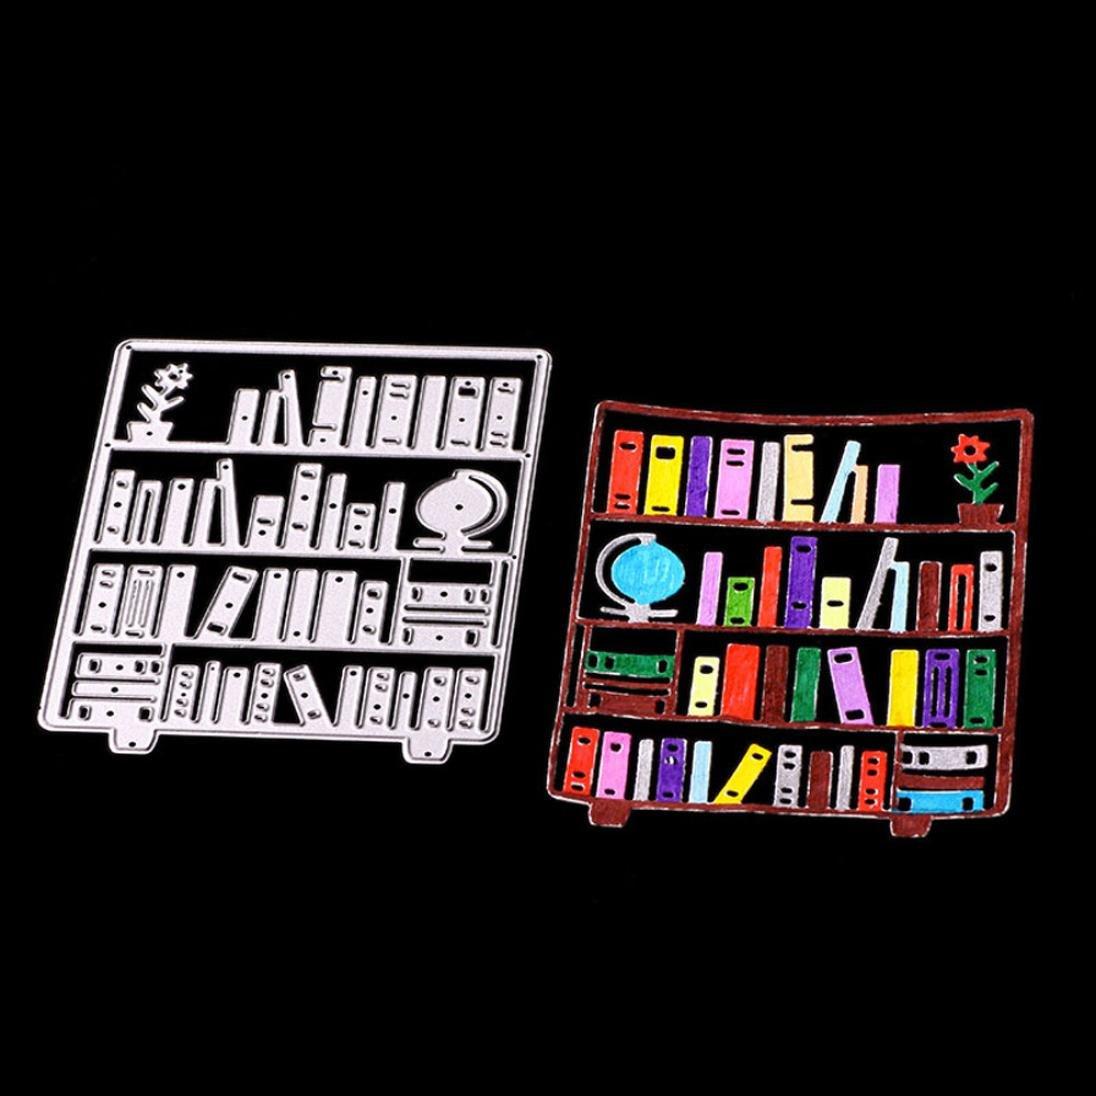 A FNKDOR Fustelle per Scrapbooking Fustella Fustellatrice Stencil DIY Metallo Embossing Cutting Dies Carta Album Foto Accessori per Big Shot e altre macchina